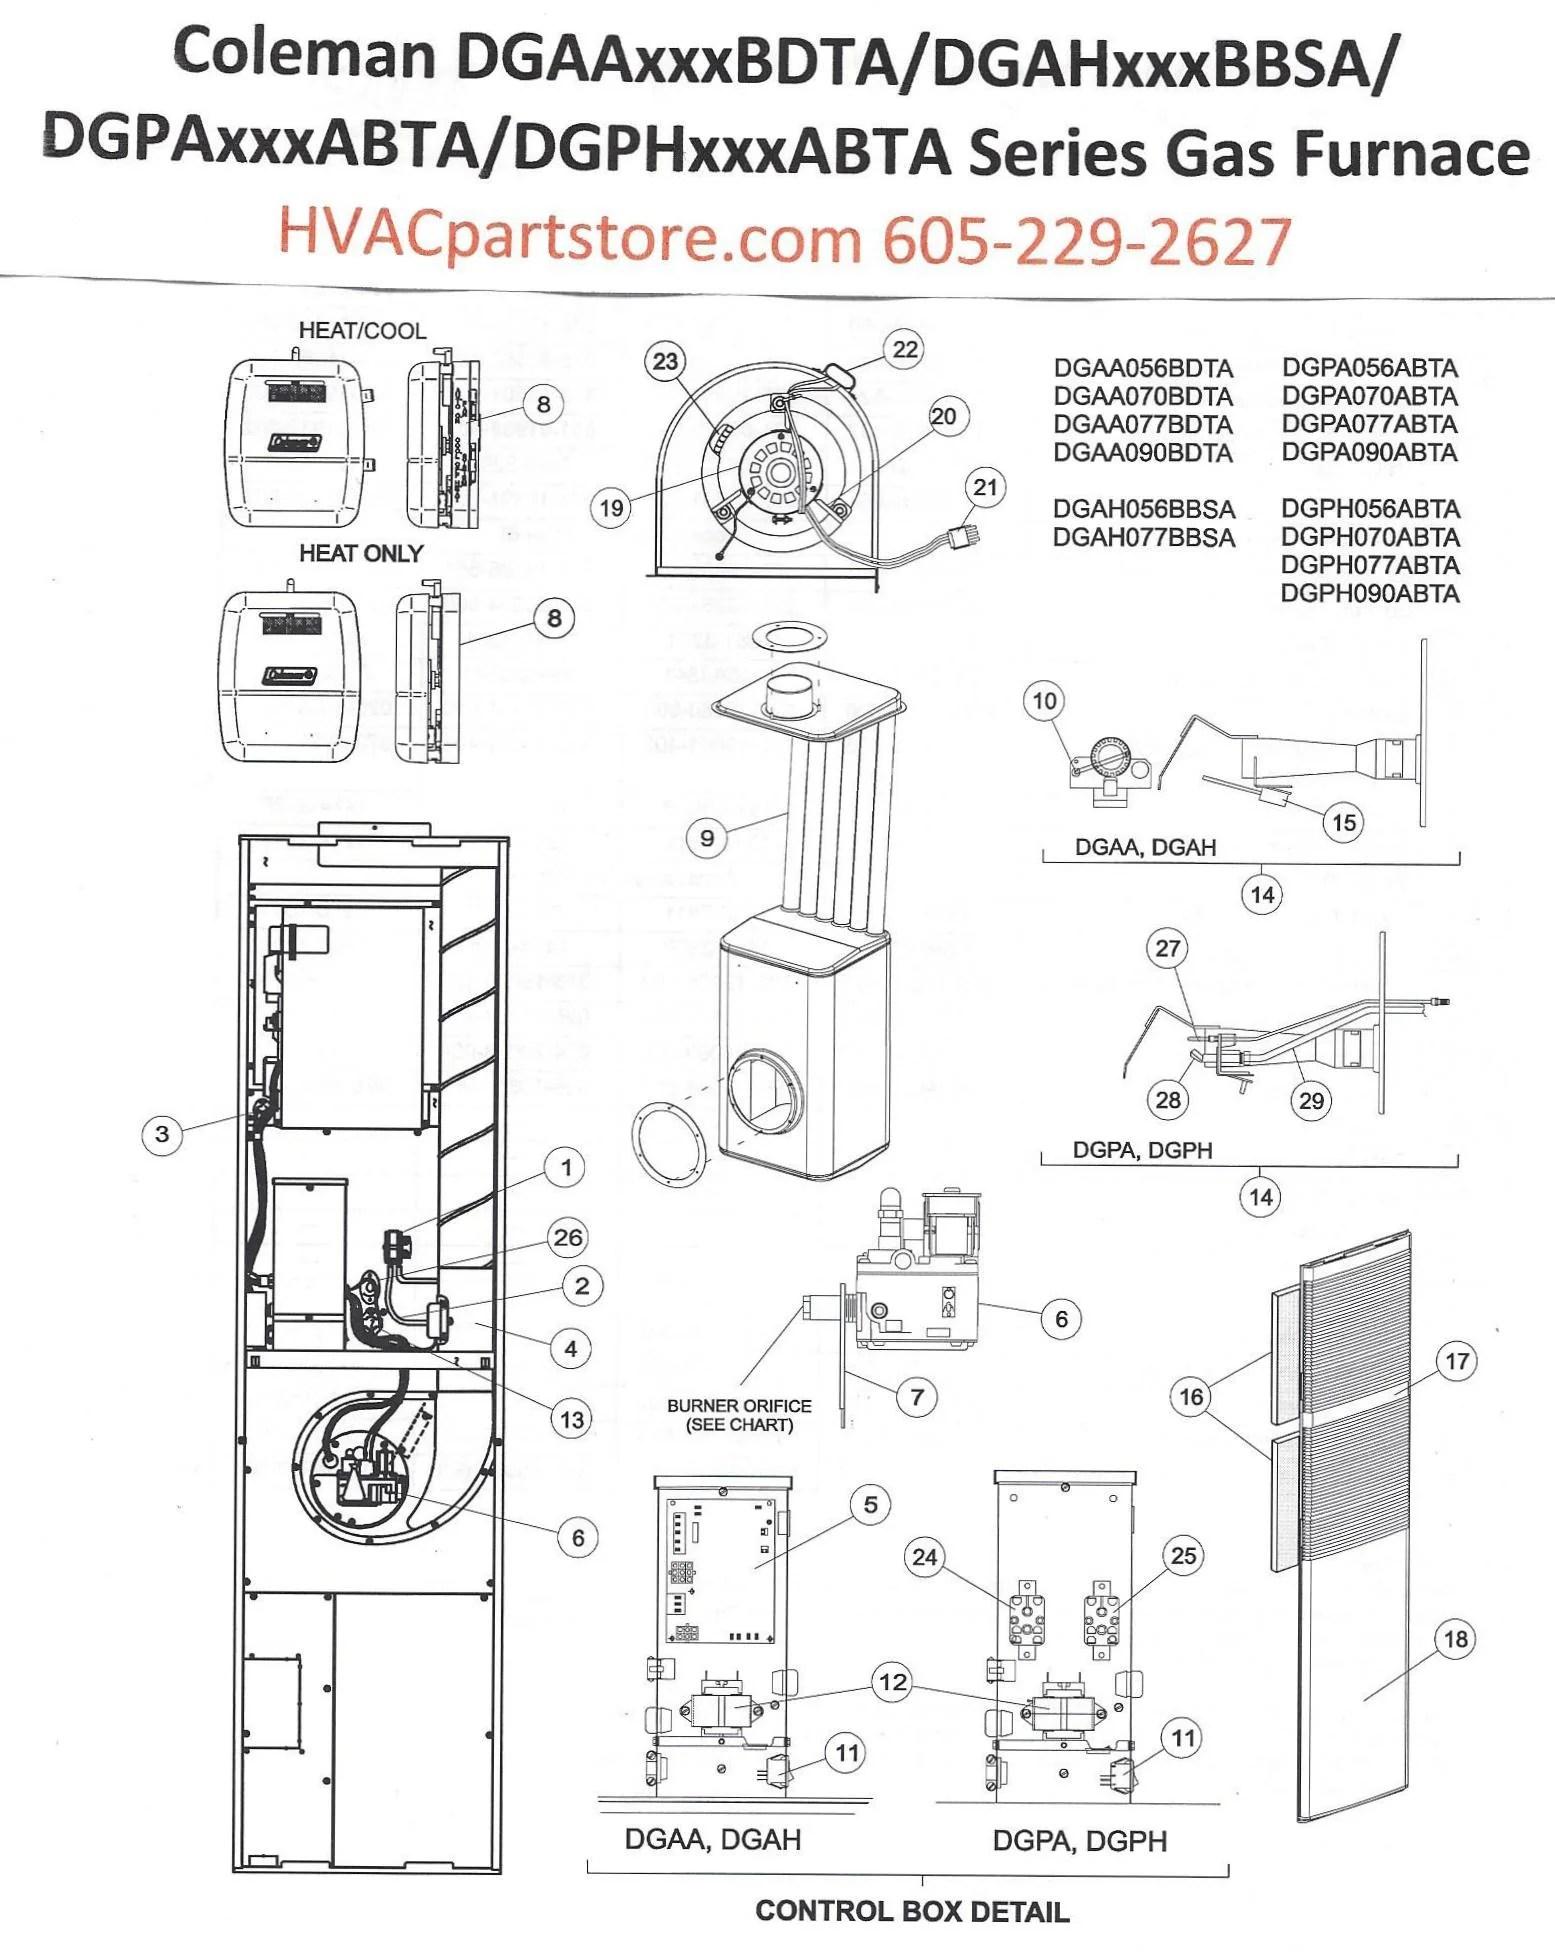 American Standard Furnace Schematic Dgaa077bdta Coleman Gas Furnace Parts Hvacpartstore